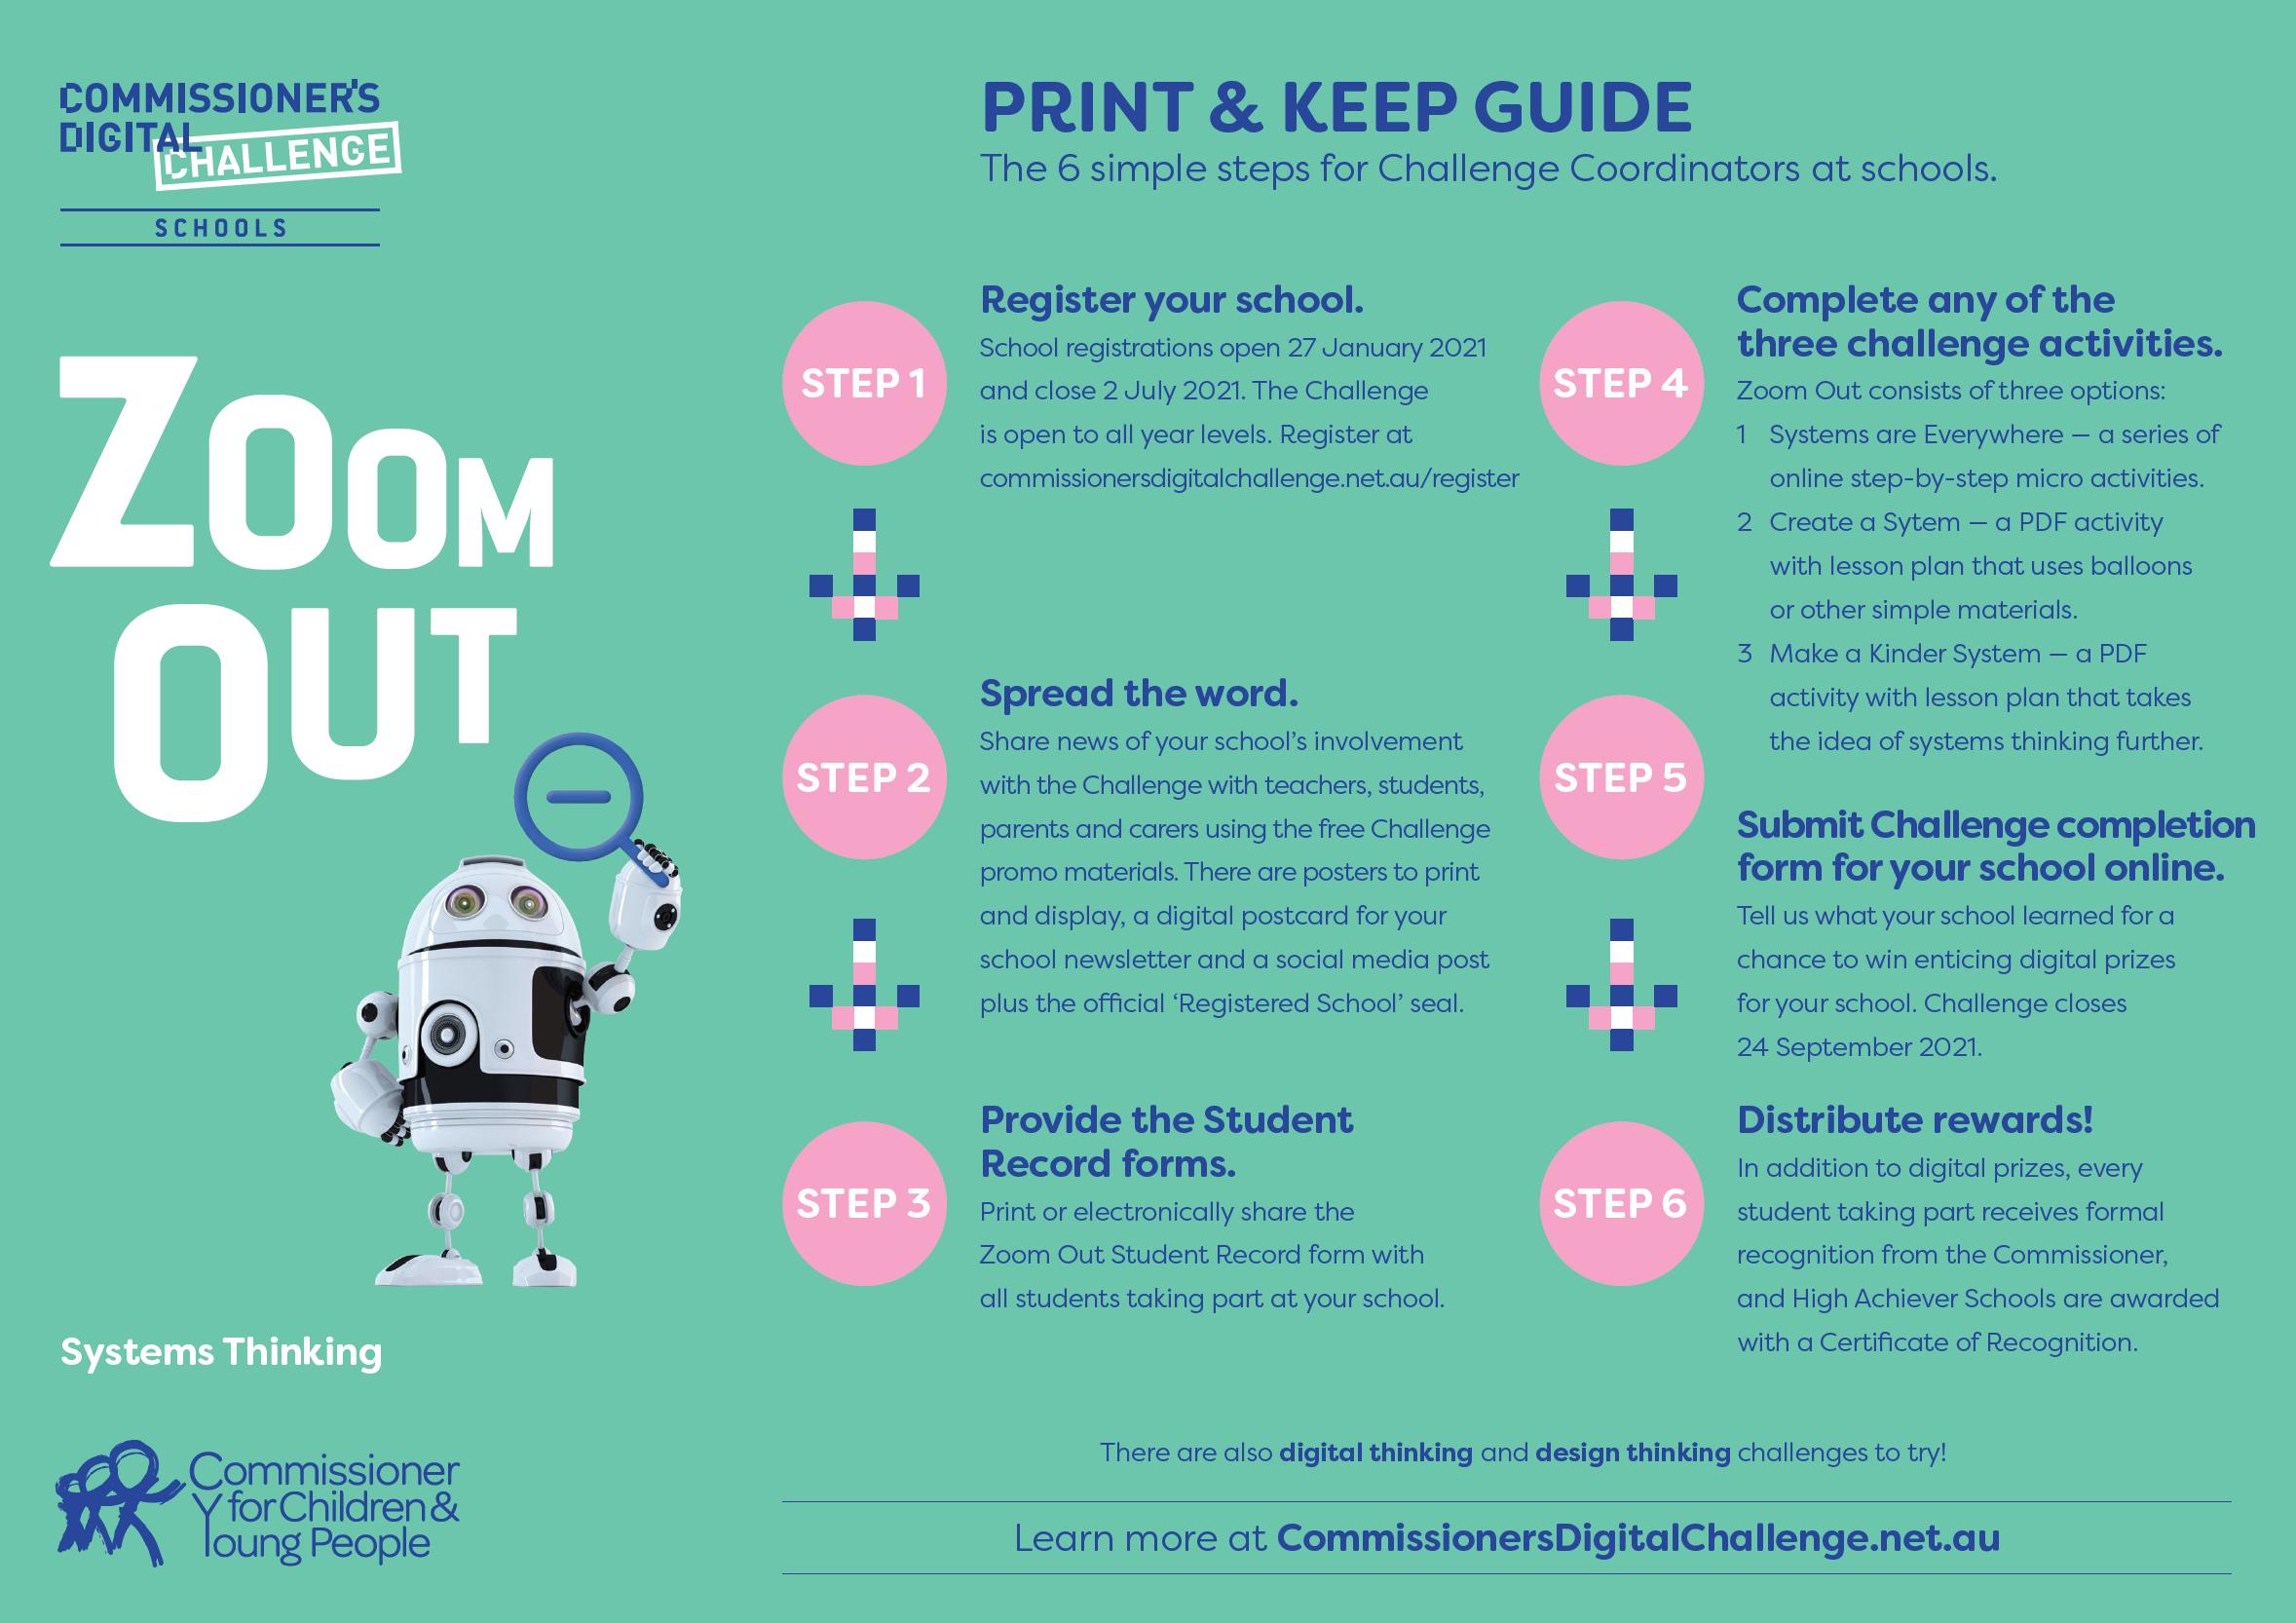 Print & Keep Guide - Six steps for Challenge Coordinators